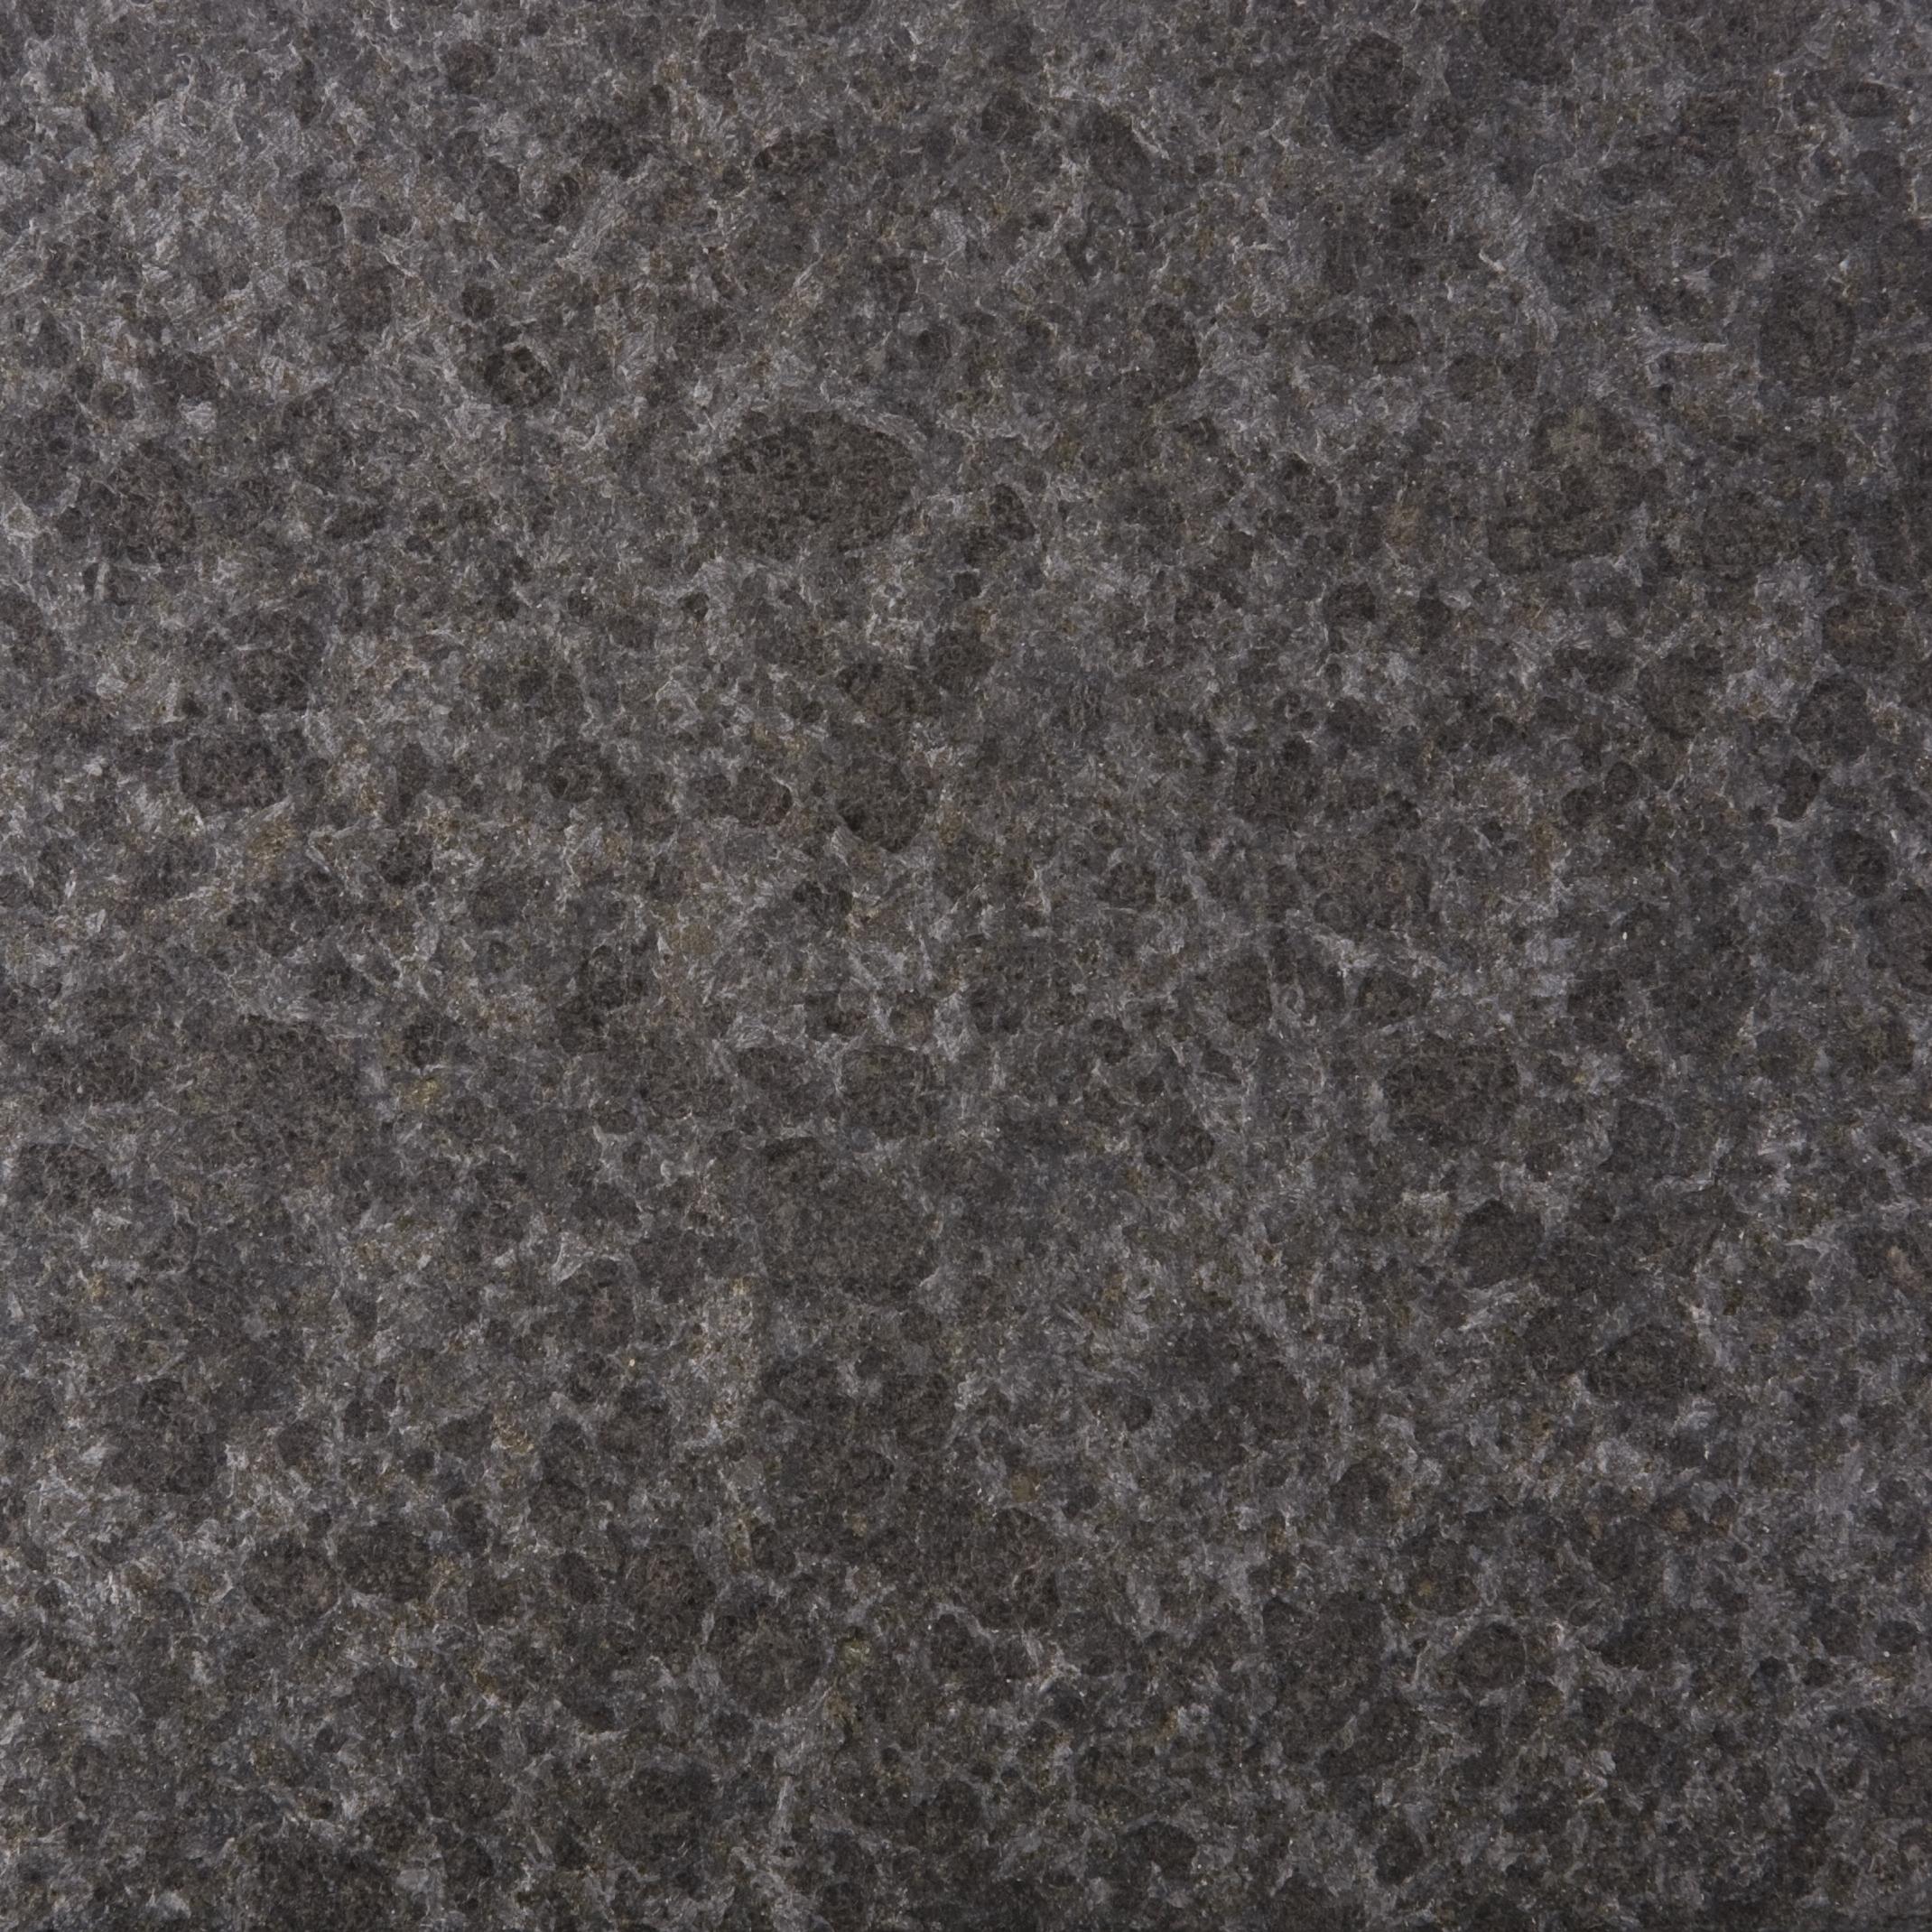 Asian G684 Black Granite